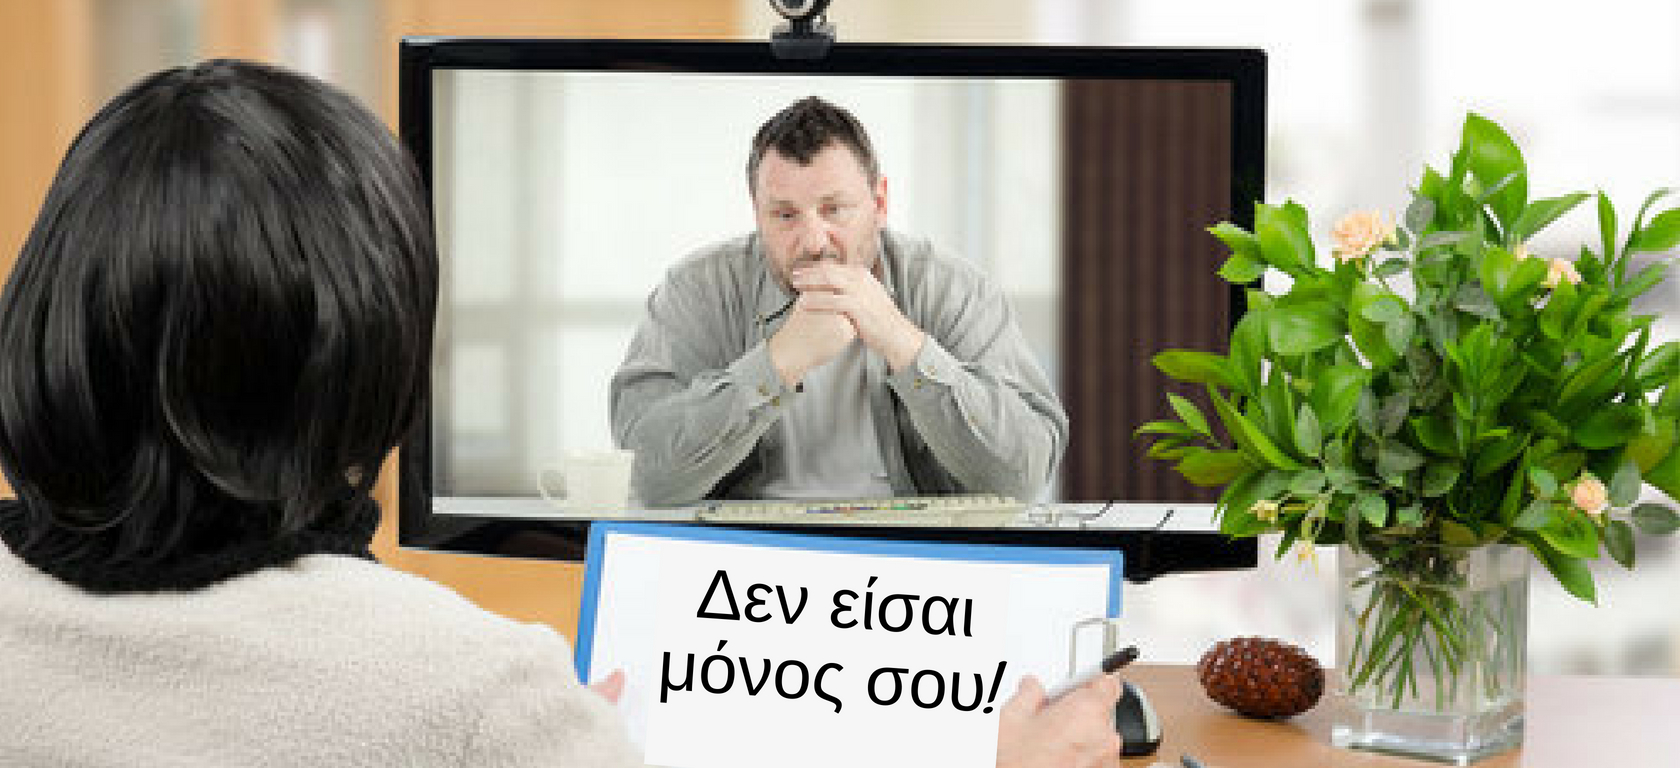 Online Συμβουλευτική μέσω Skype ή Viber